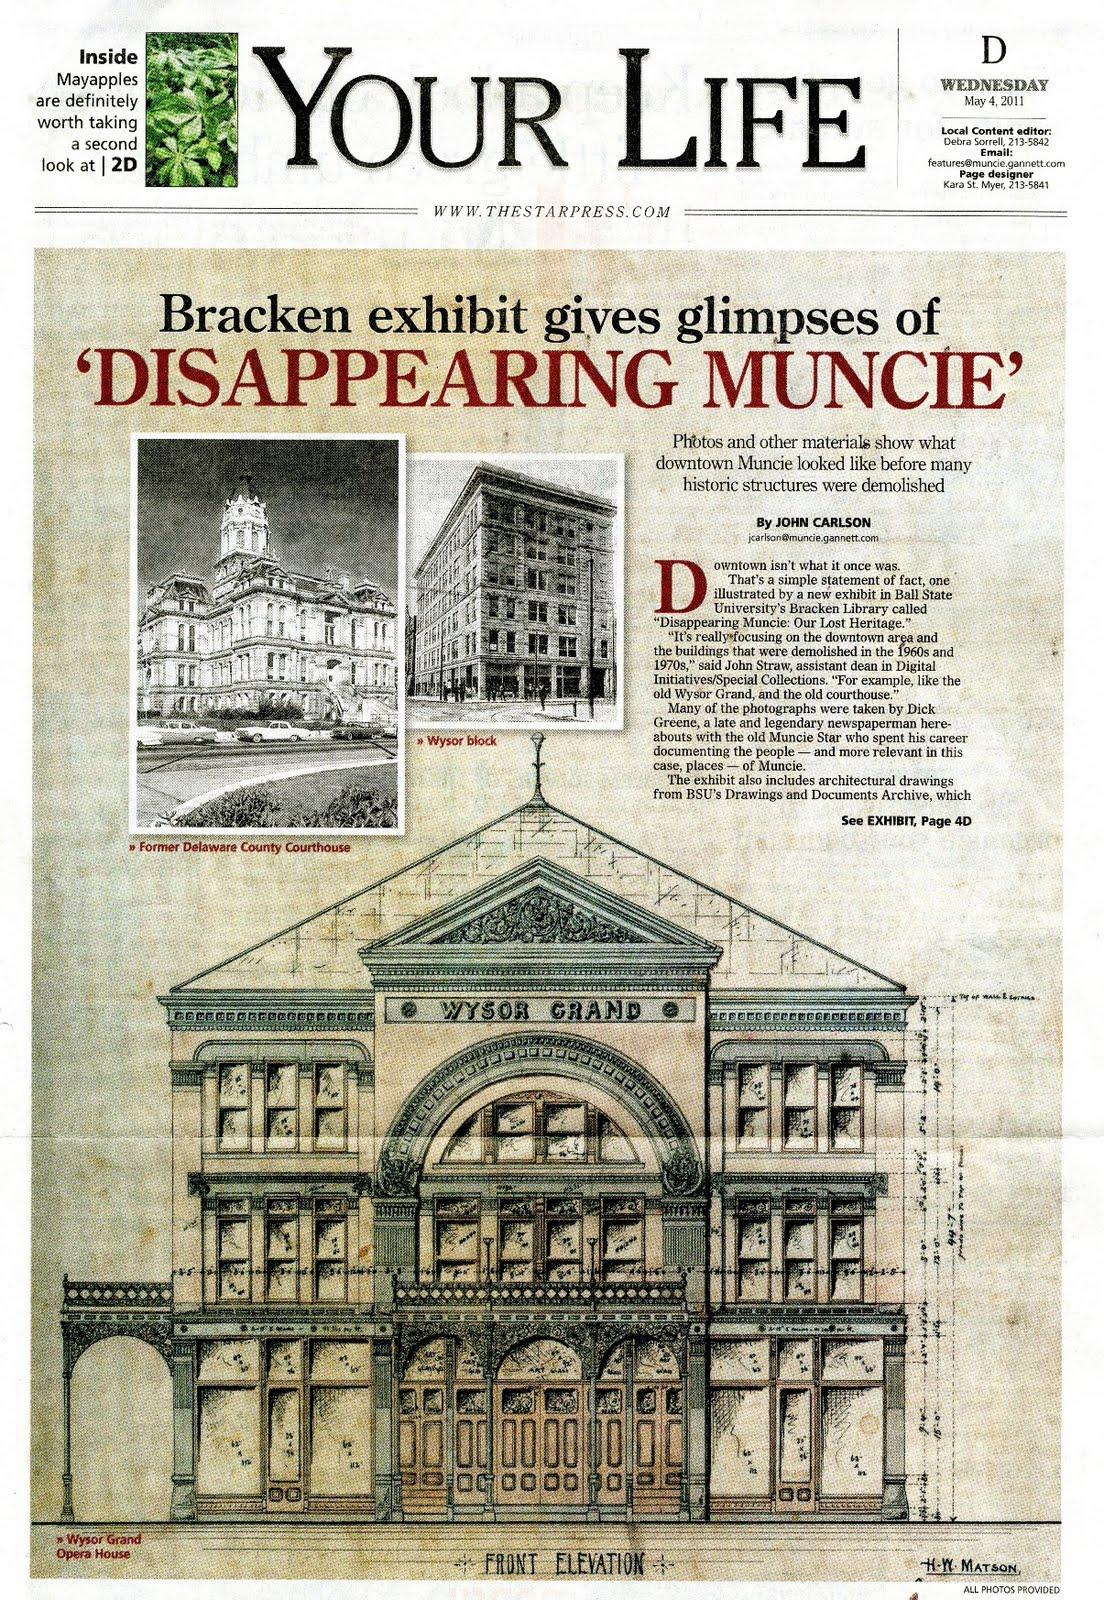 DisappearingMuncie_Exhibit+article_Page_1.jpg